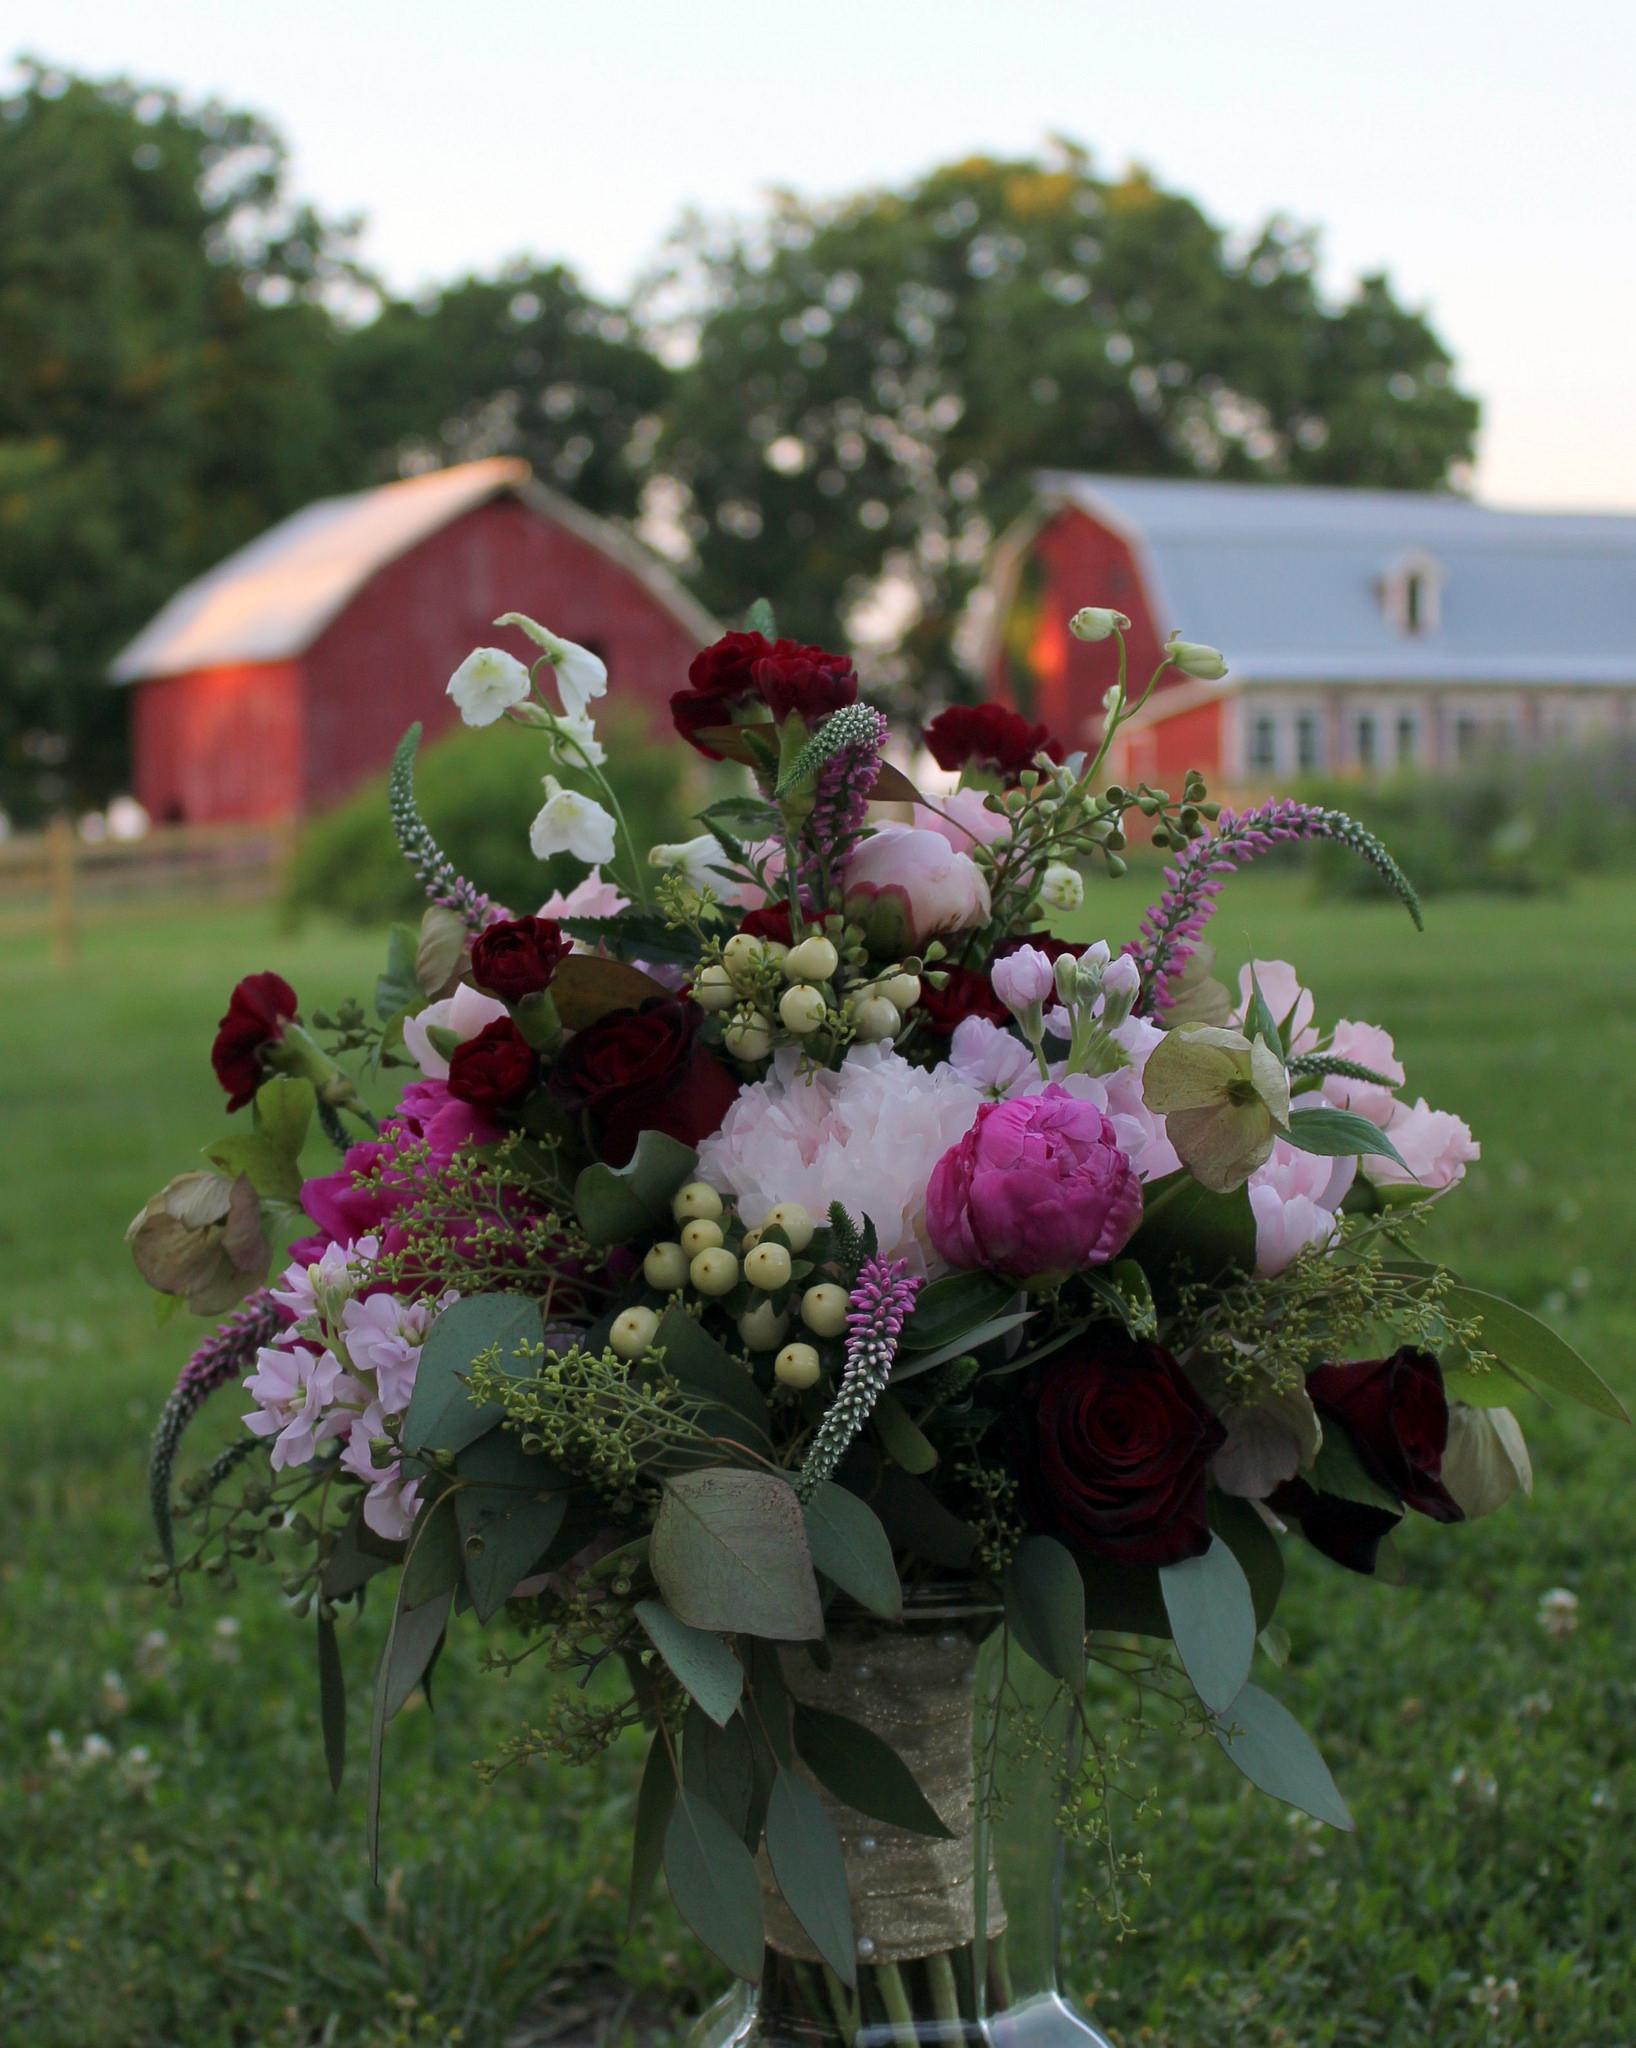 2016 Walnut Grove Farm Weddings - Click here to view!